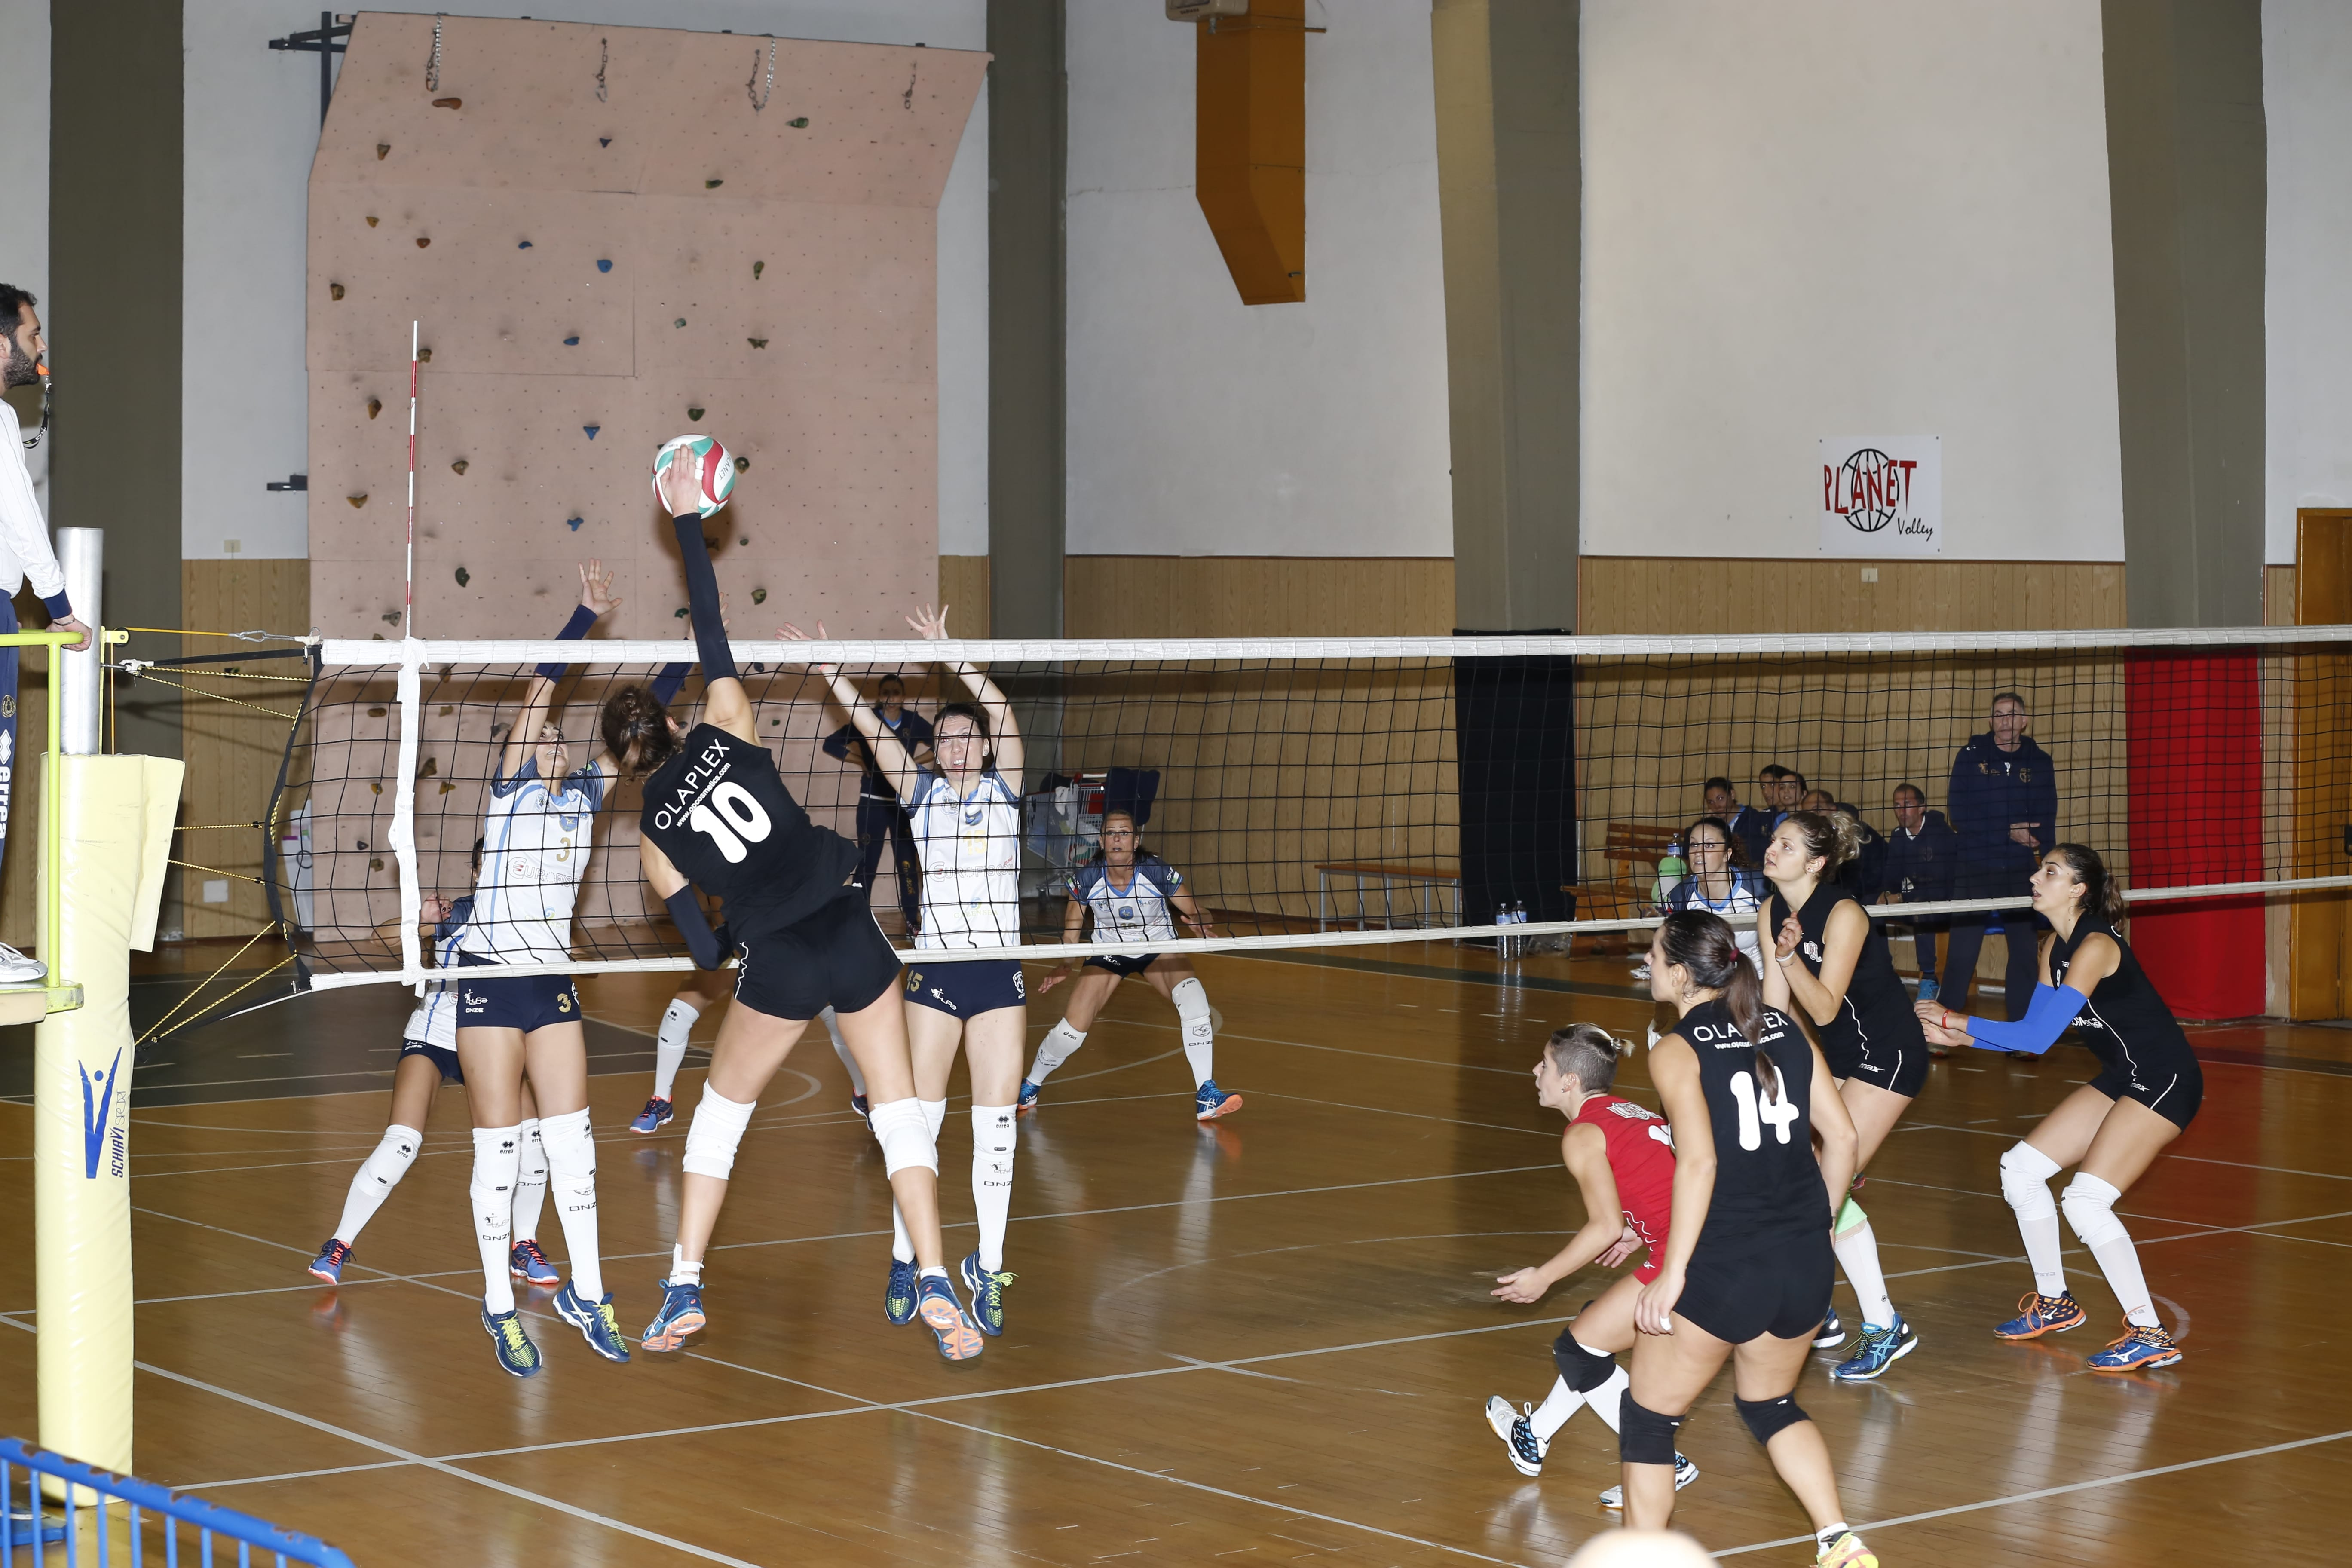 Partita 3 Planet Volley - OP e lo sport